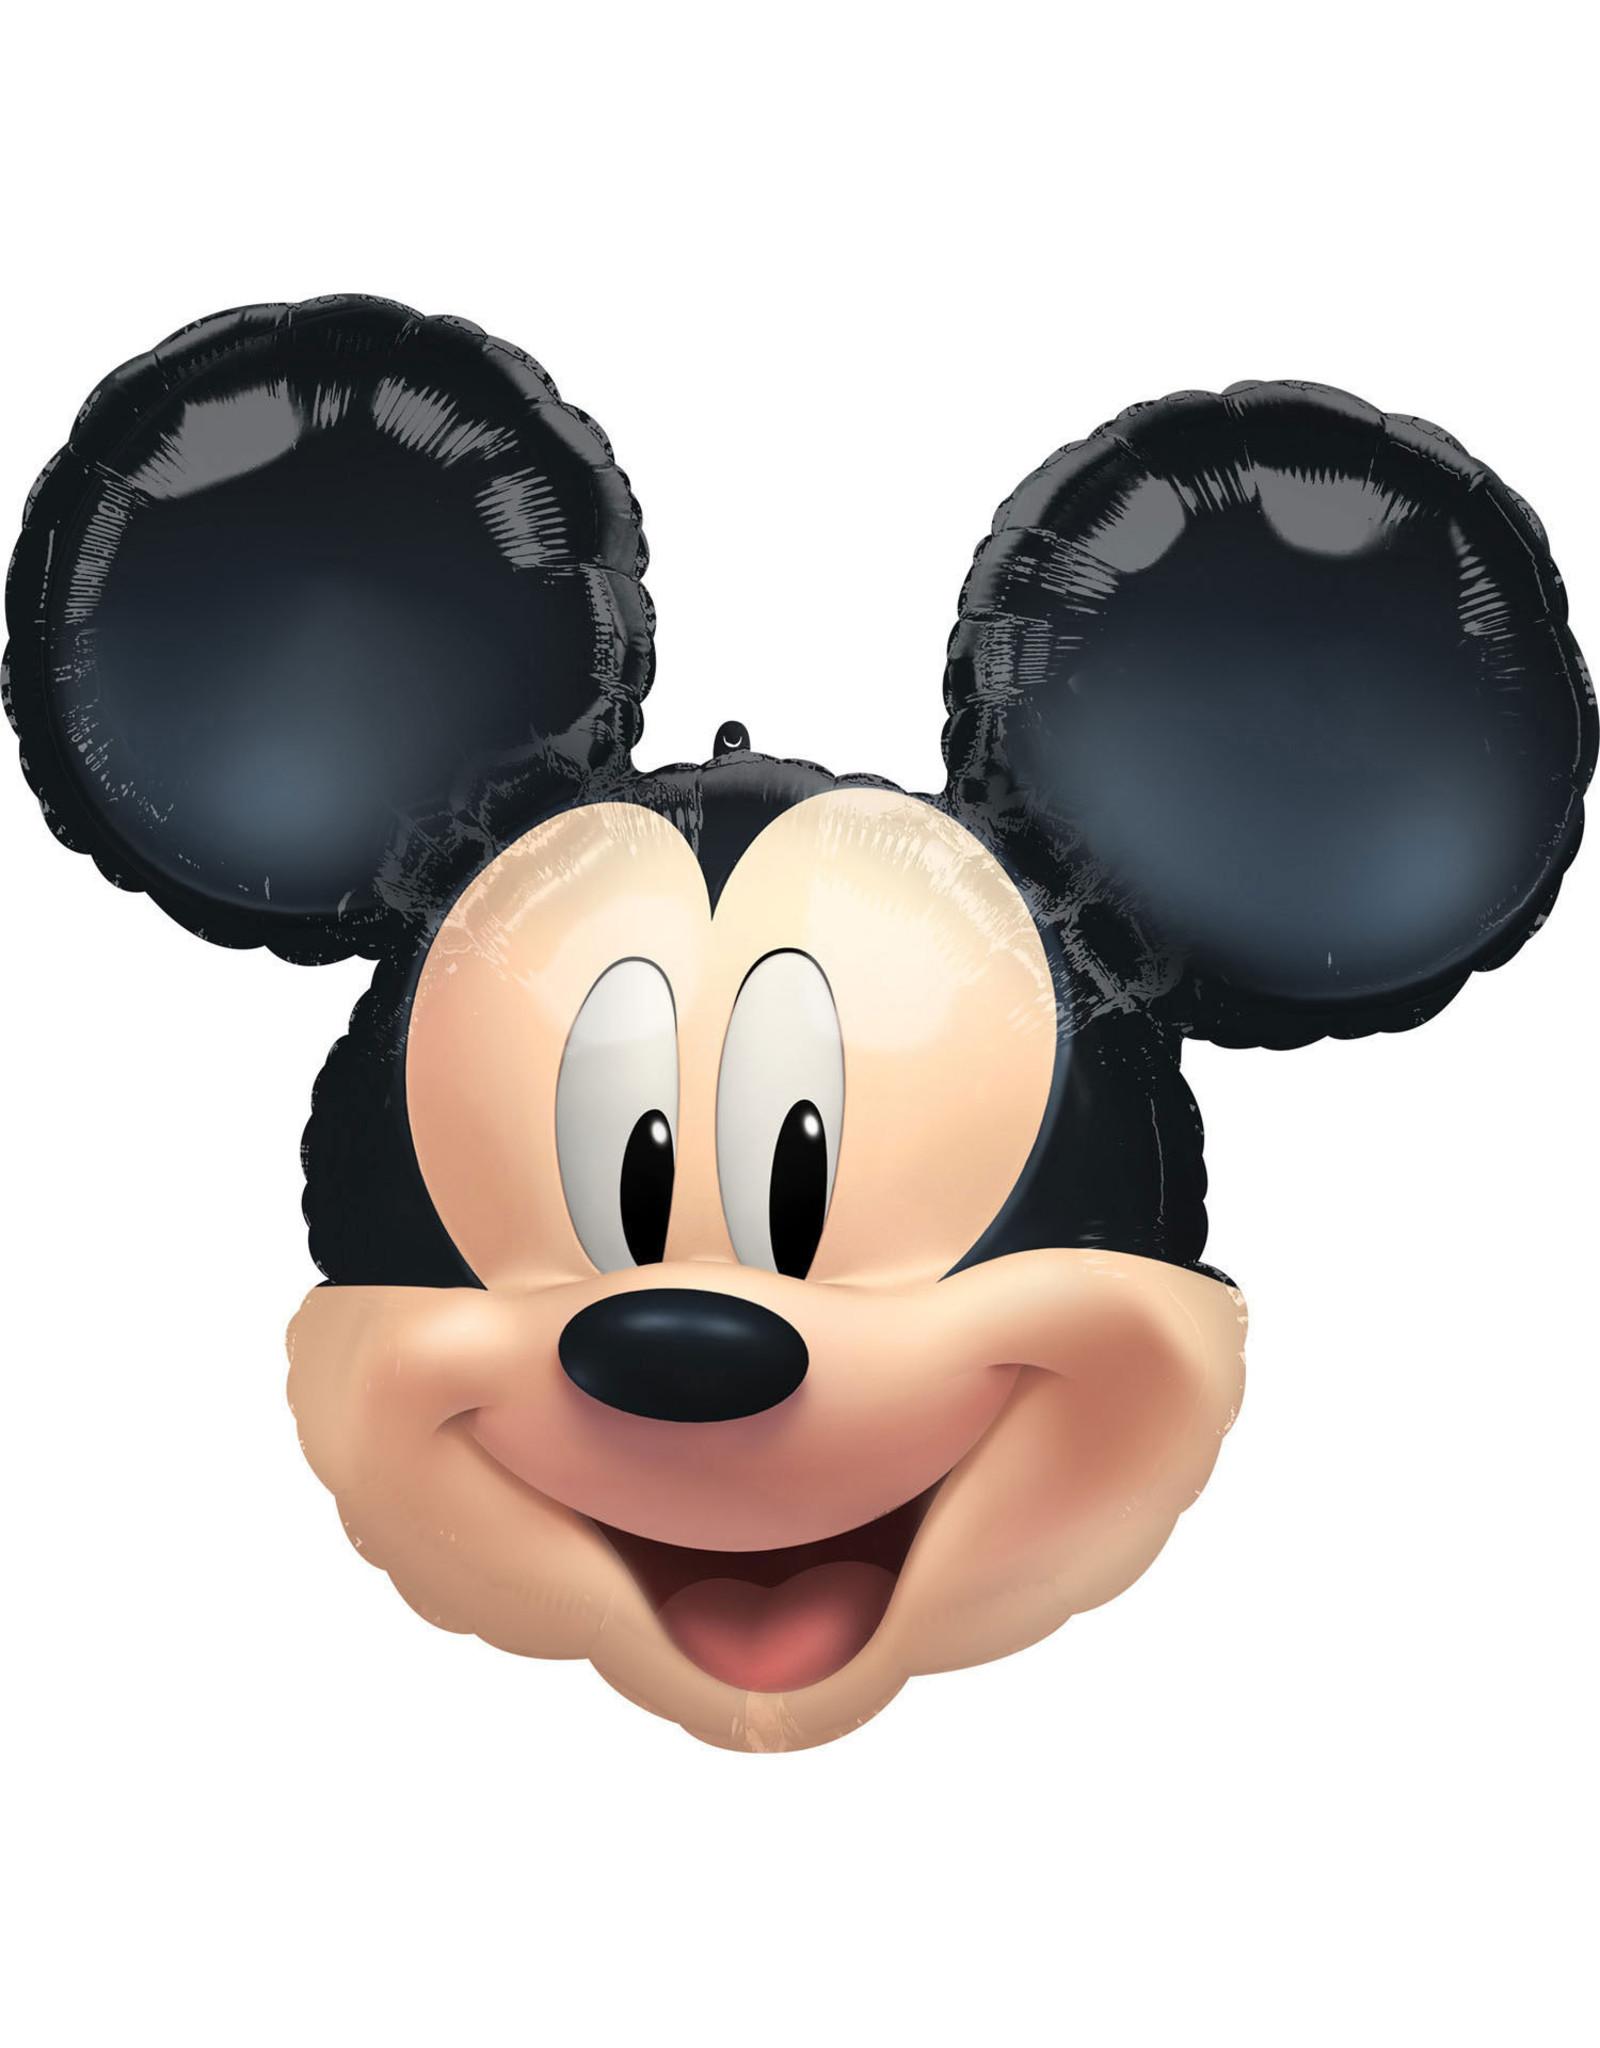 Amscan folieballon Disney jr Mickey Mouse 63 x 55 cm